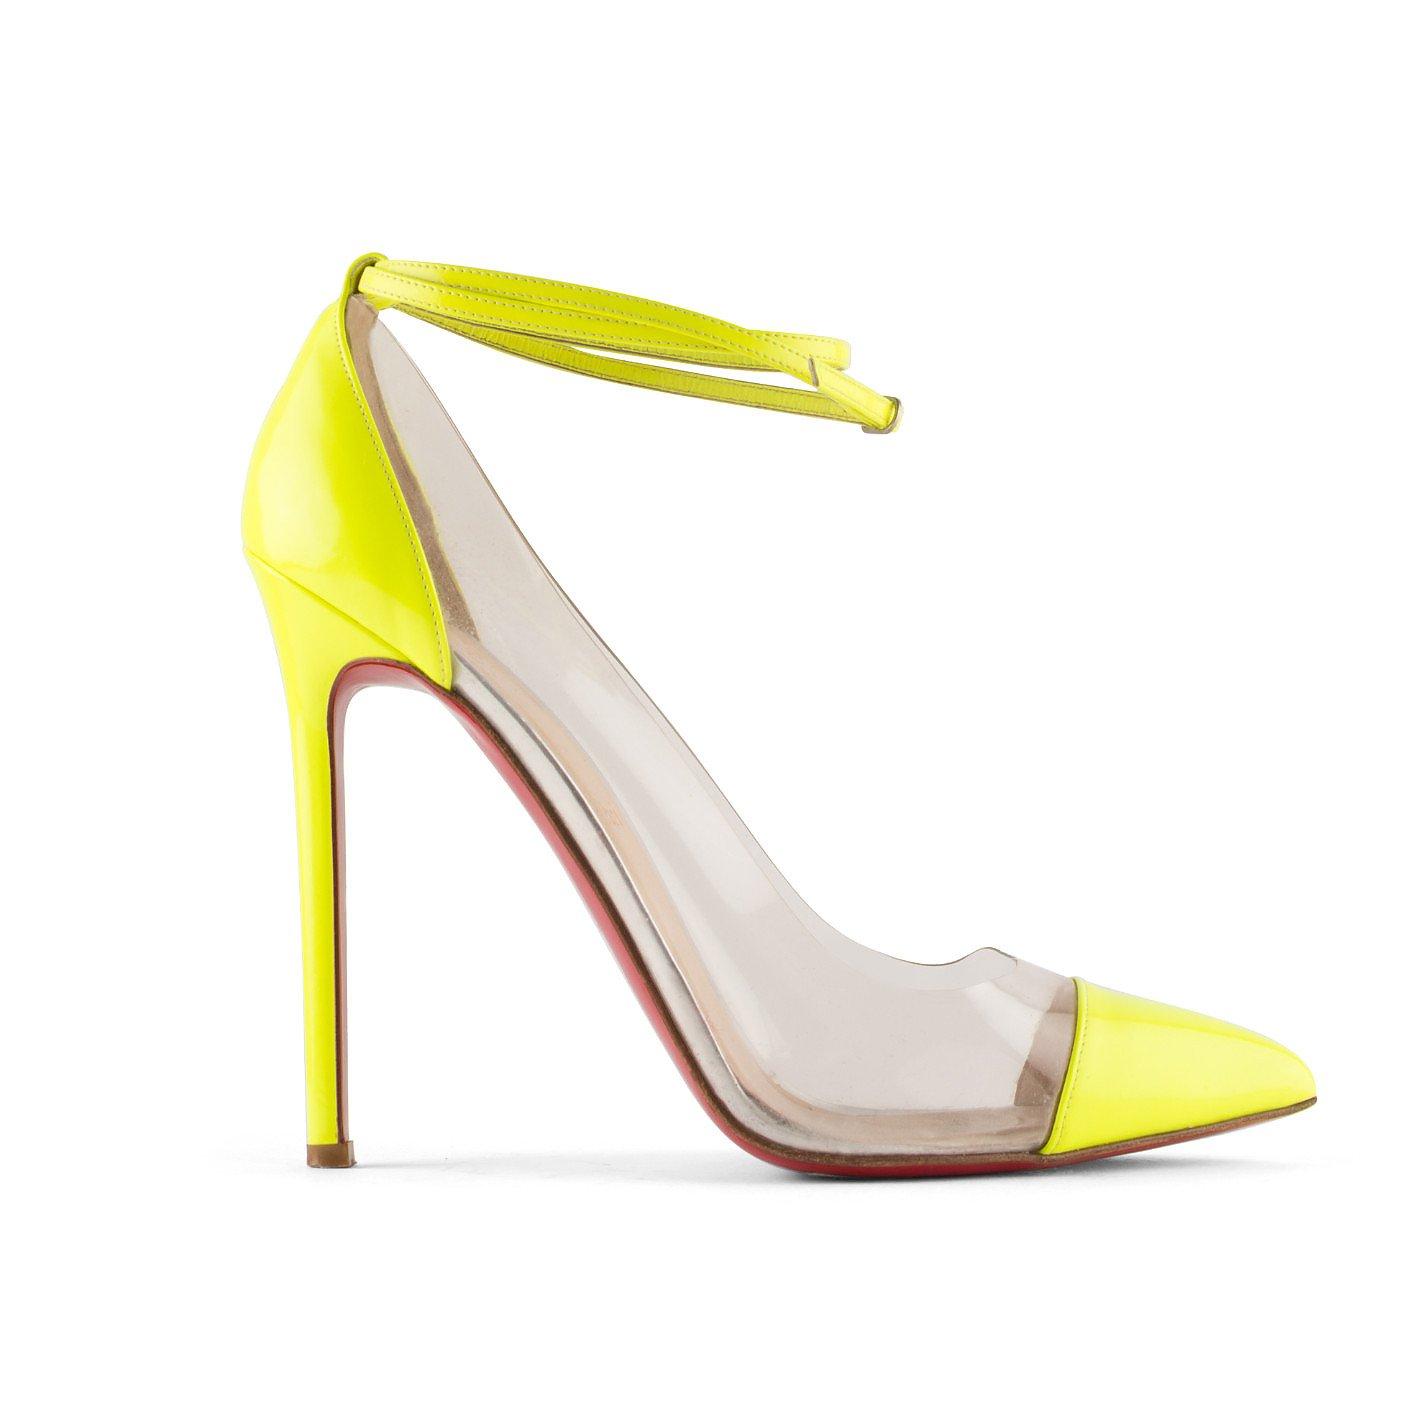 Christian Louboutin Bis Un Bout PVC Ankle Strap Pumps